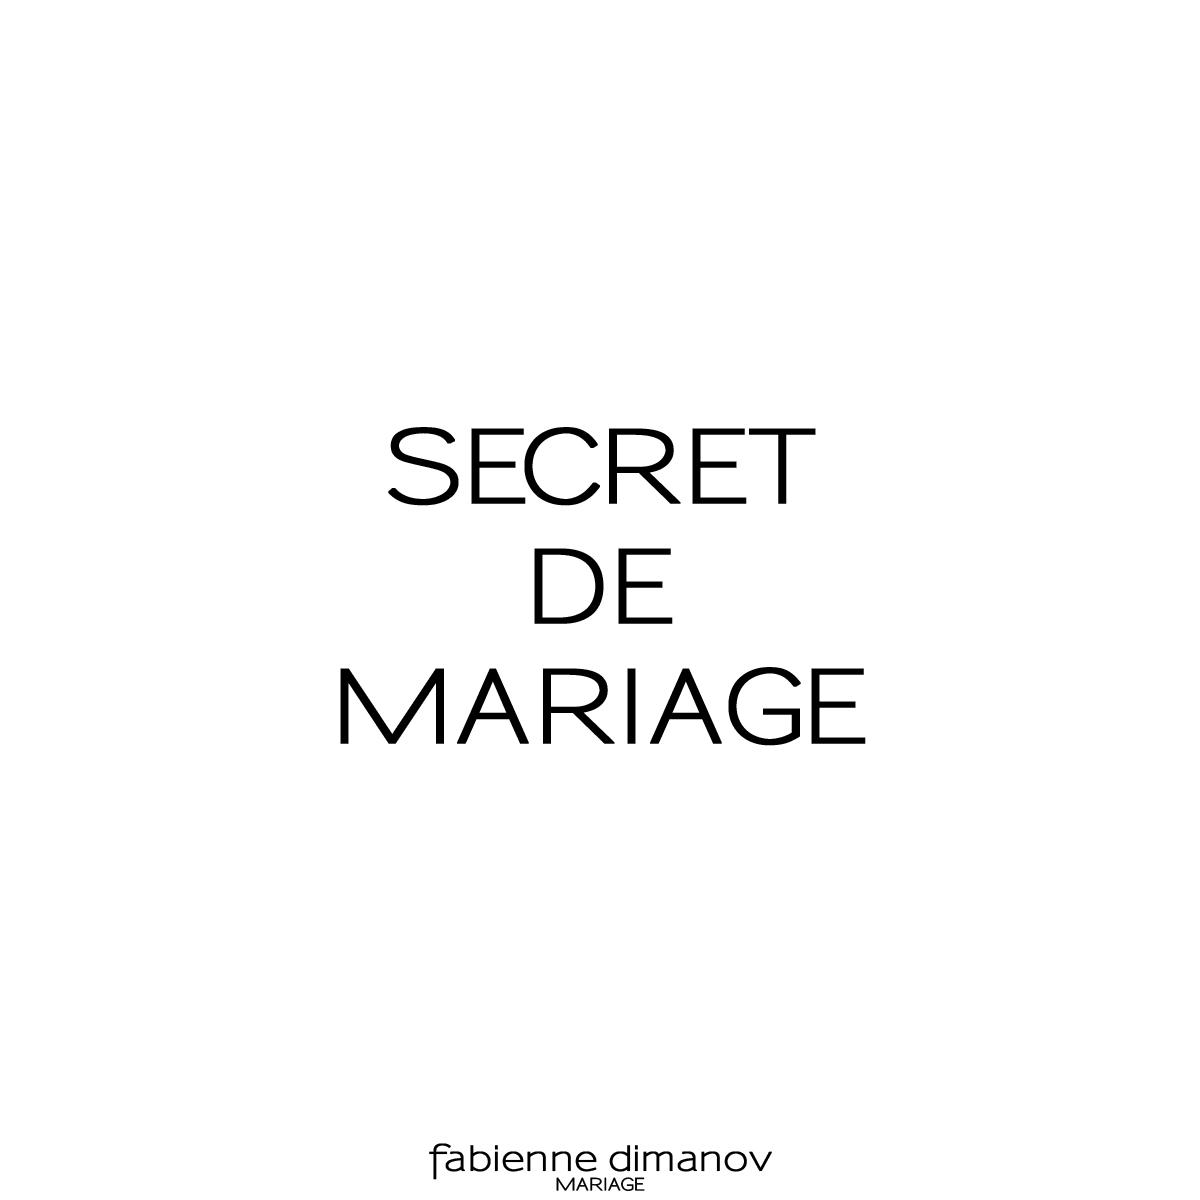 SECRET DE MARIAGE - Fabienne Dimanov Mariage